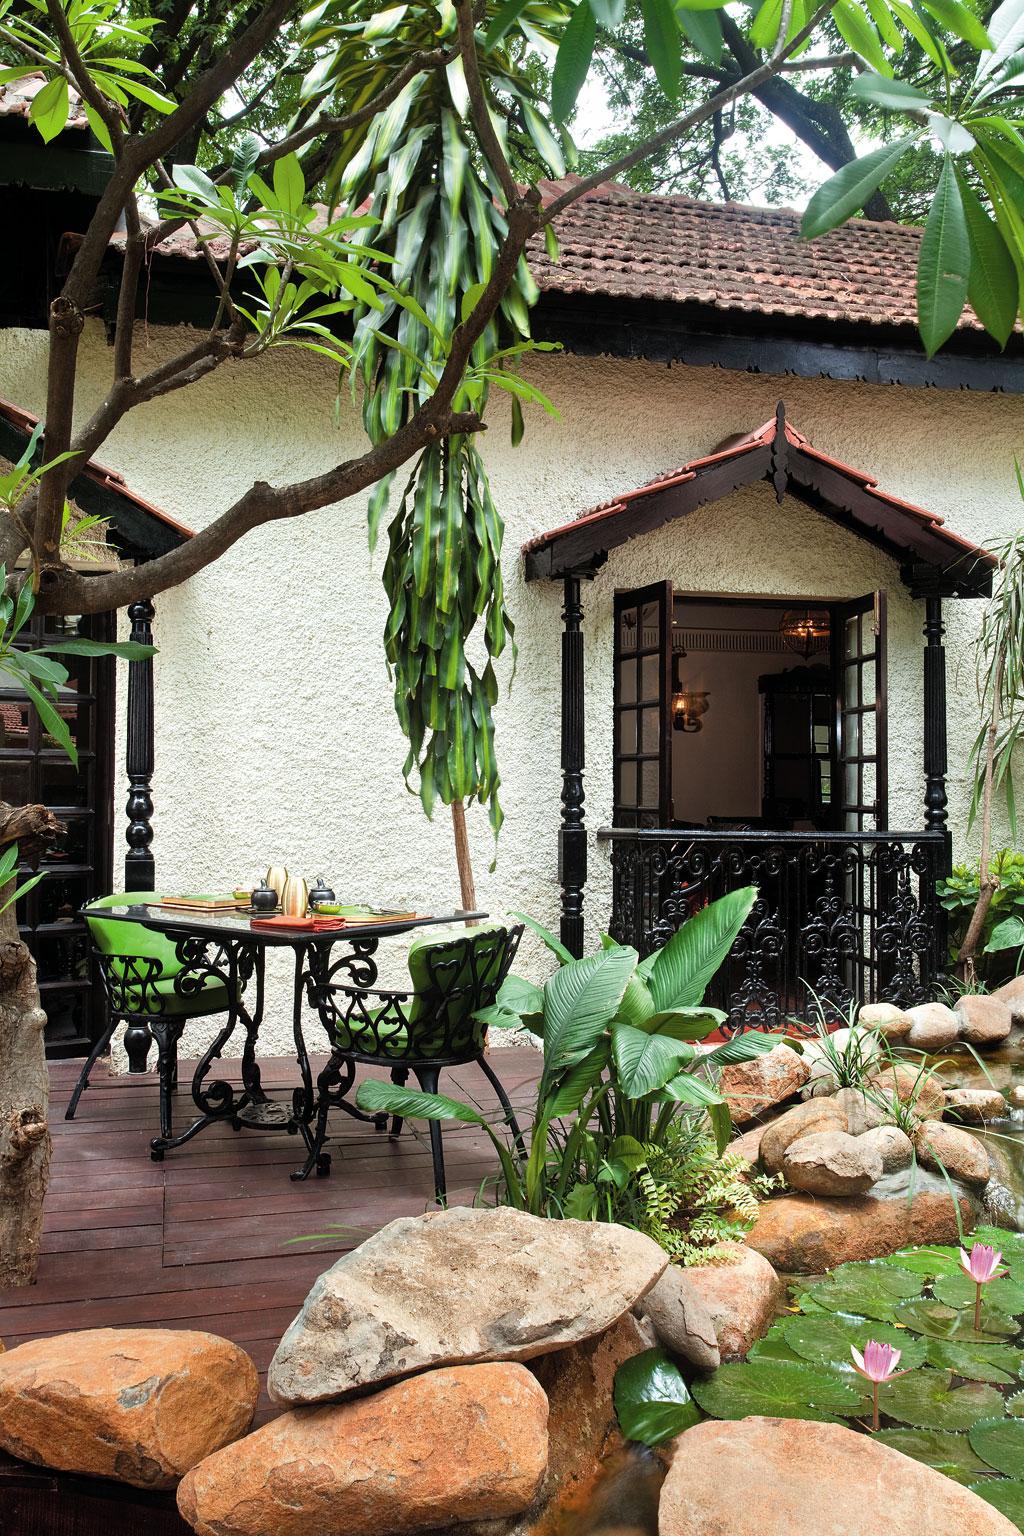 Interiors of Karavalli restaurant in Bengaluru